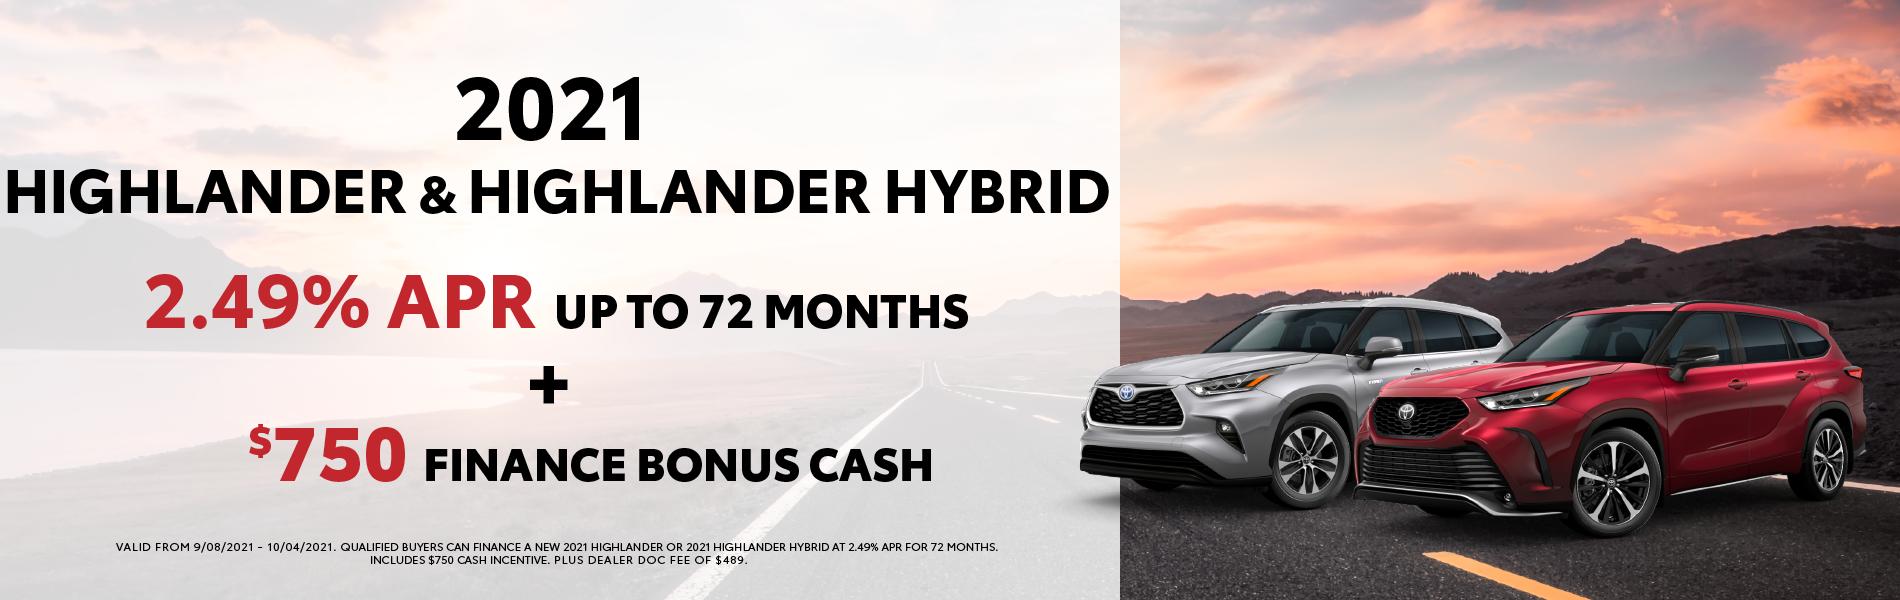 Highlander & Highlander Hybrid